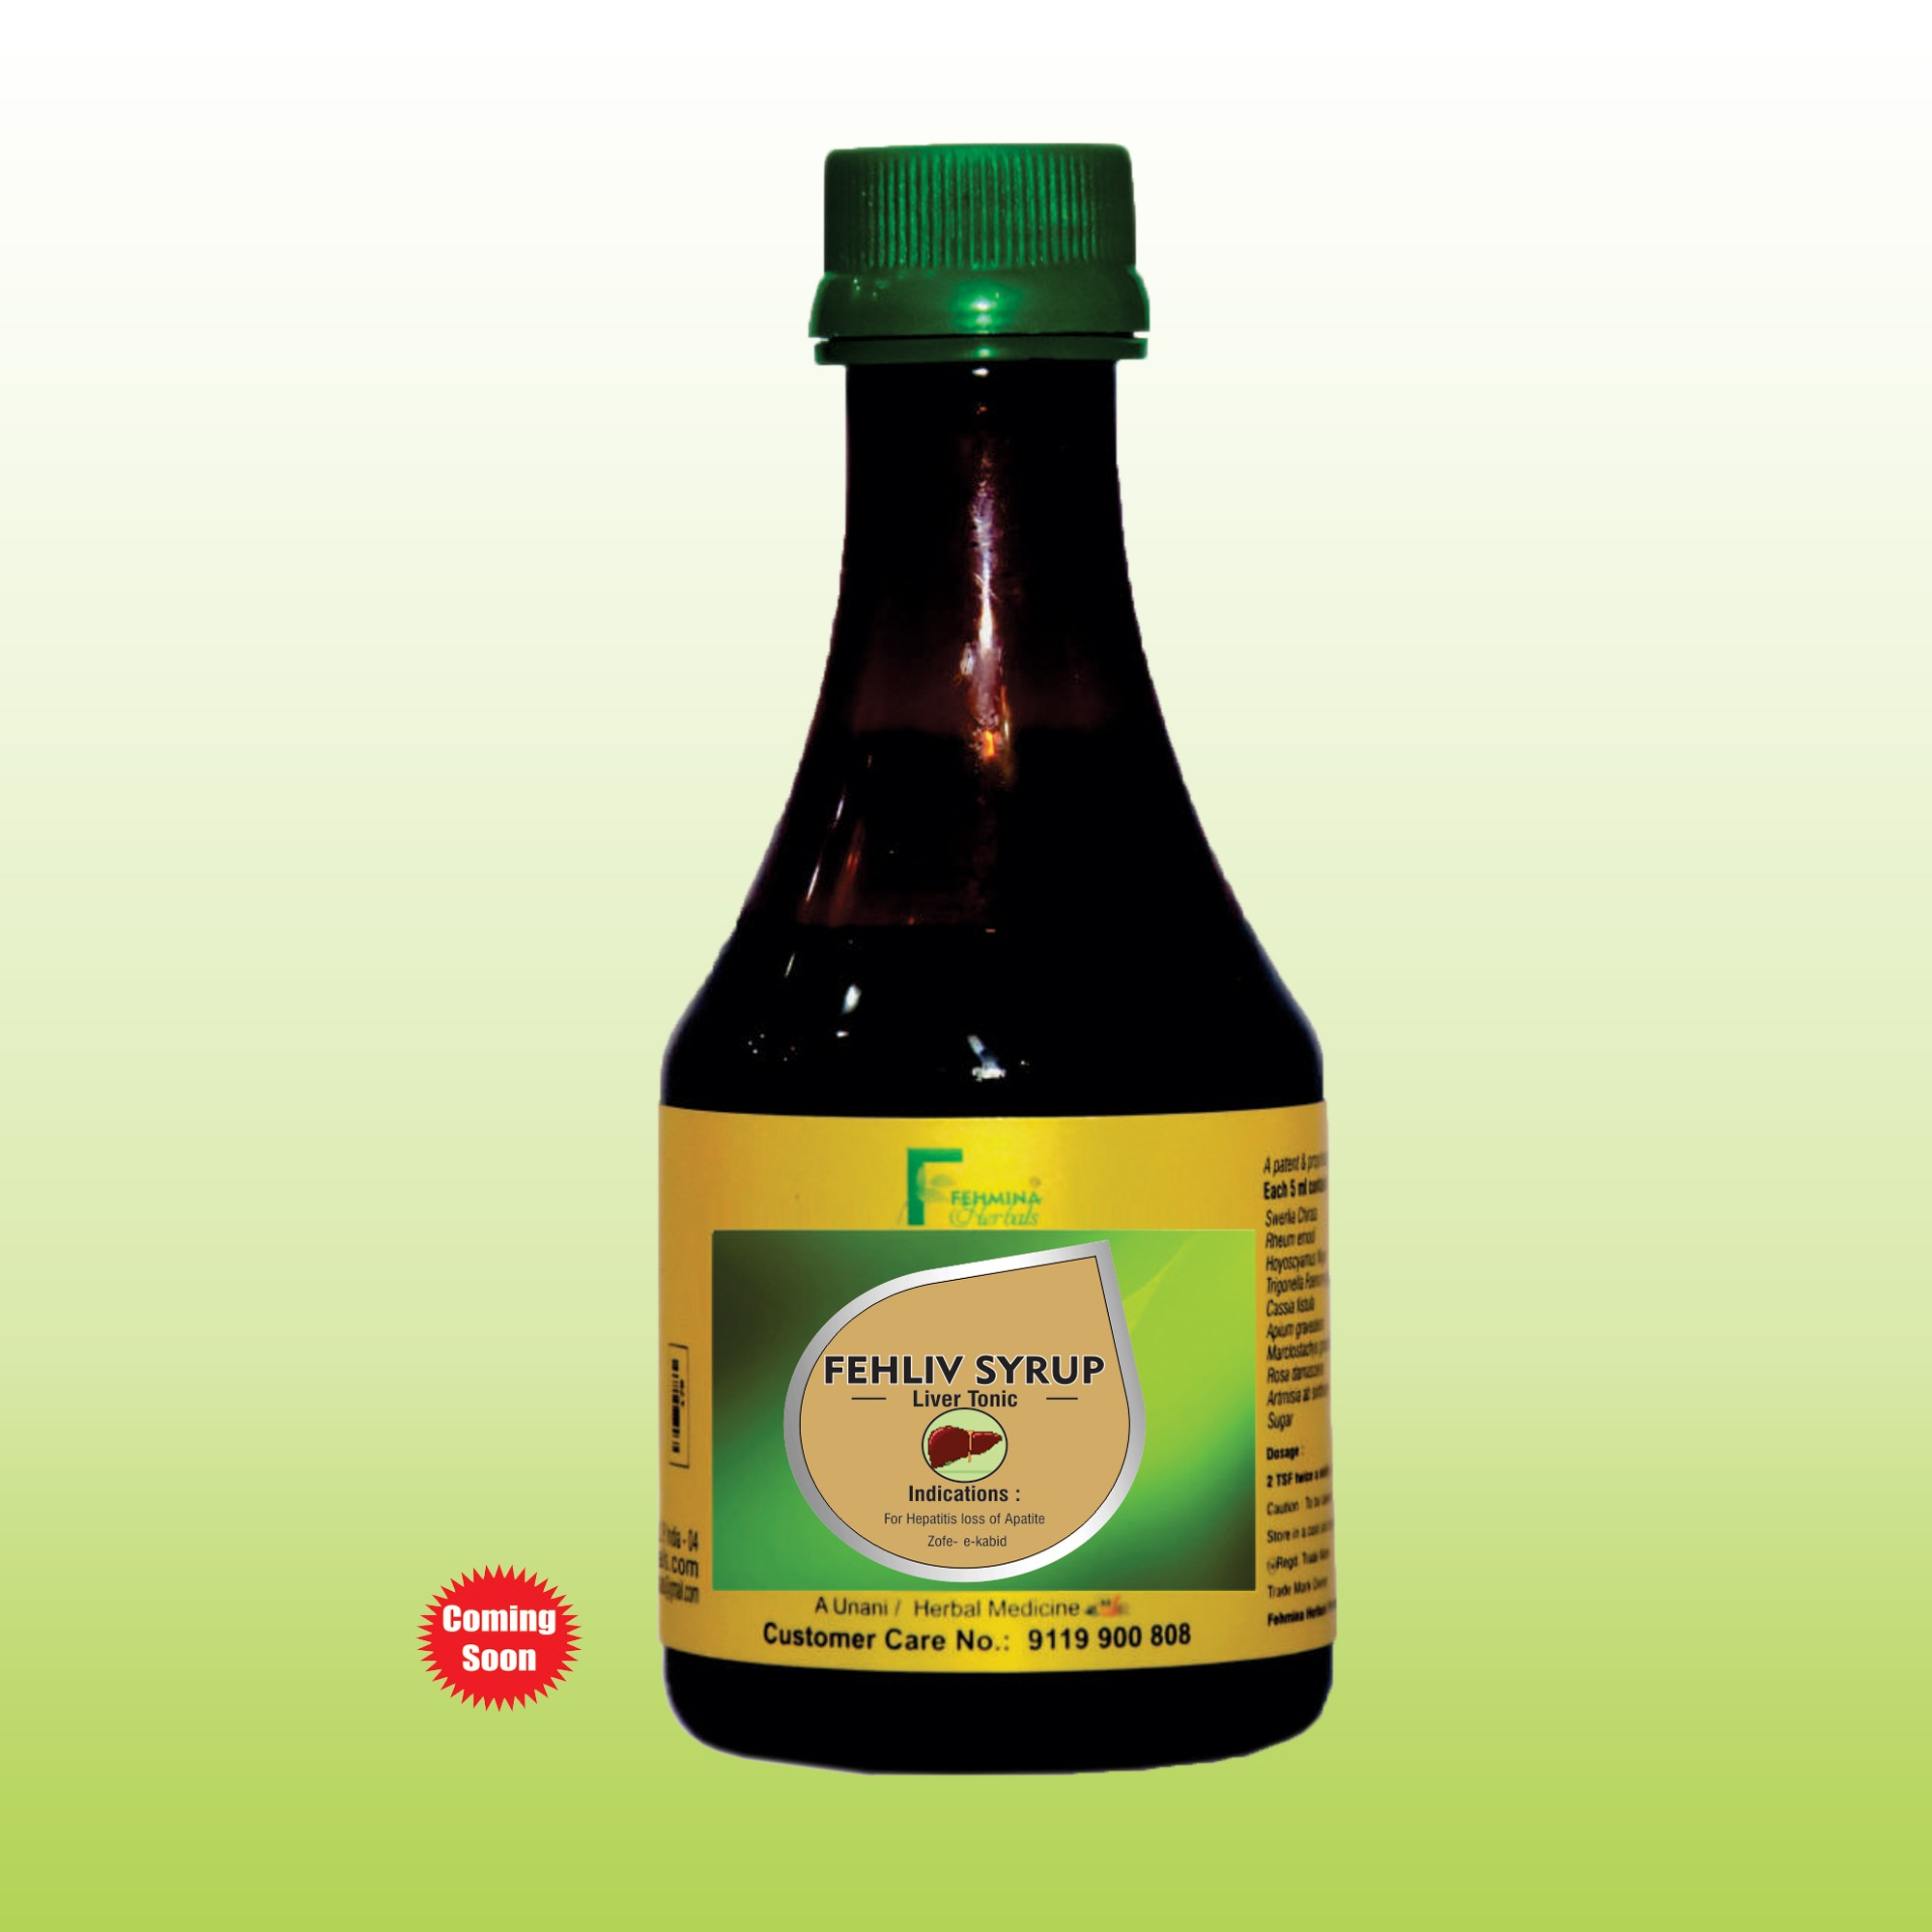 Fehliv Syrup